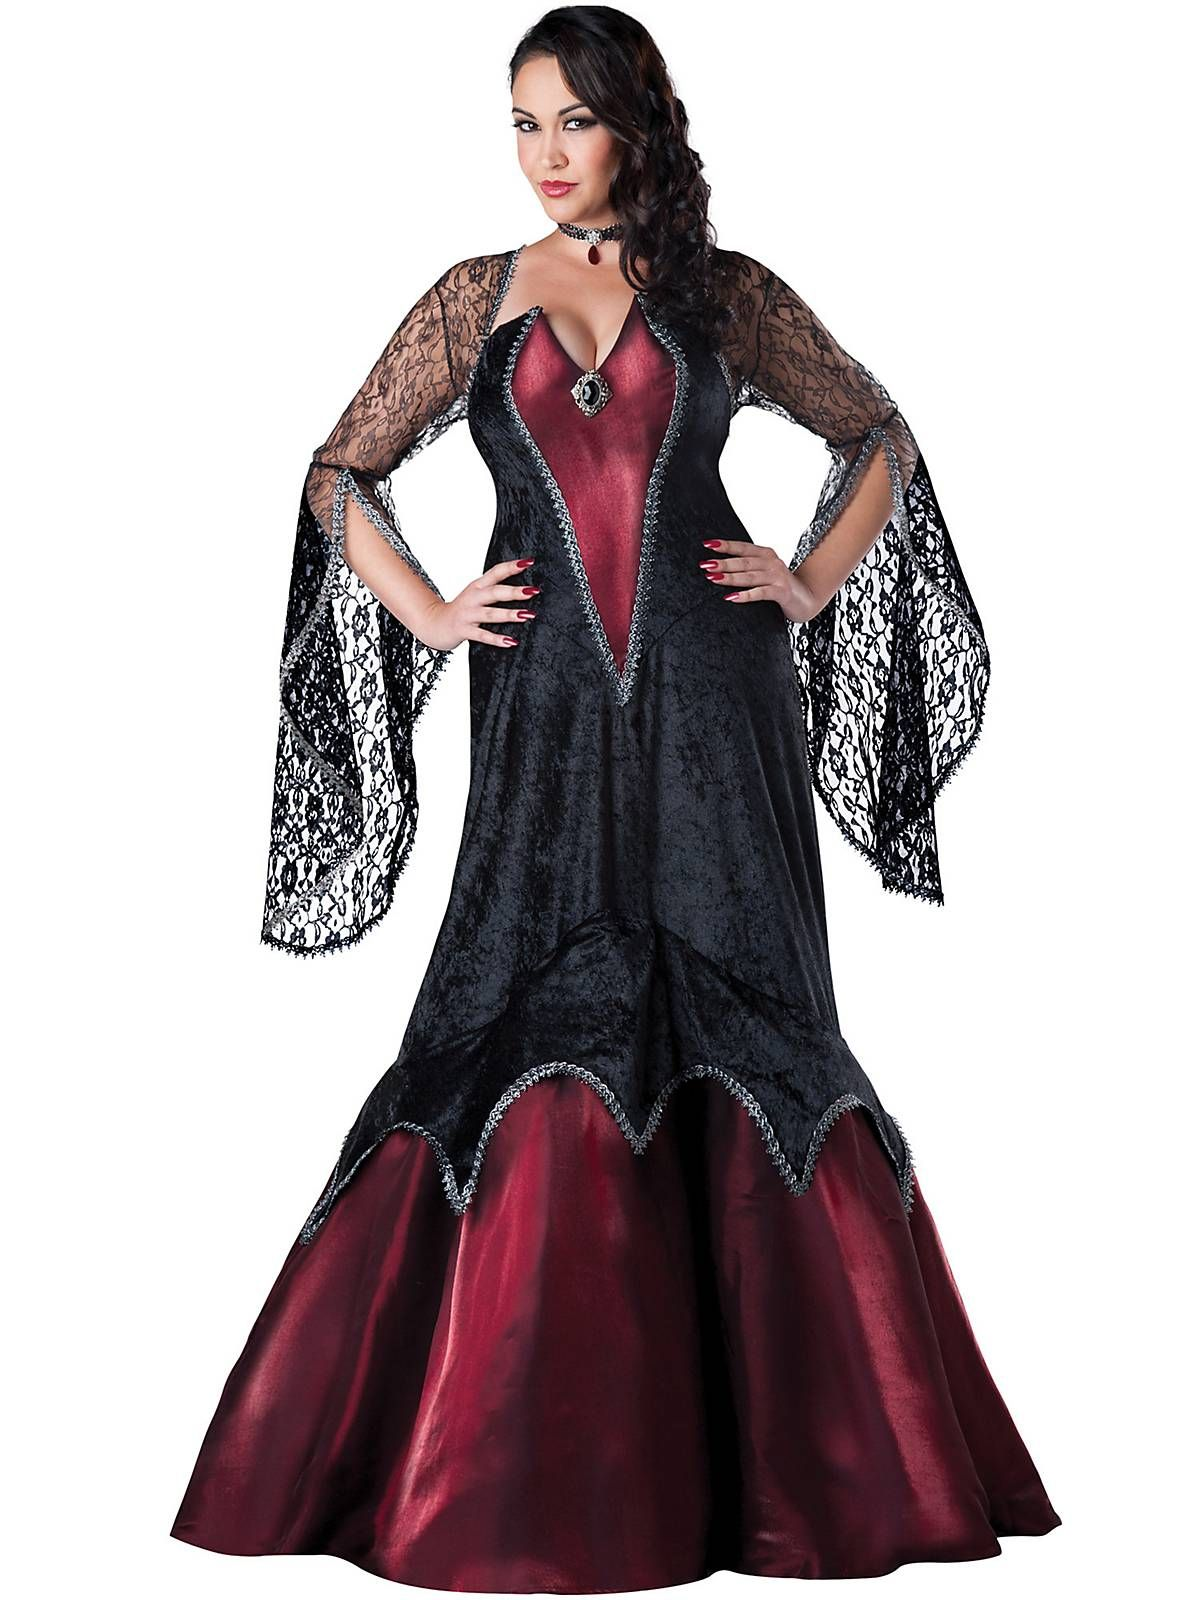 Women's Plus Size Plus Size Piercing Beauty Costume